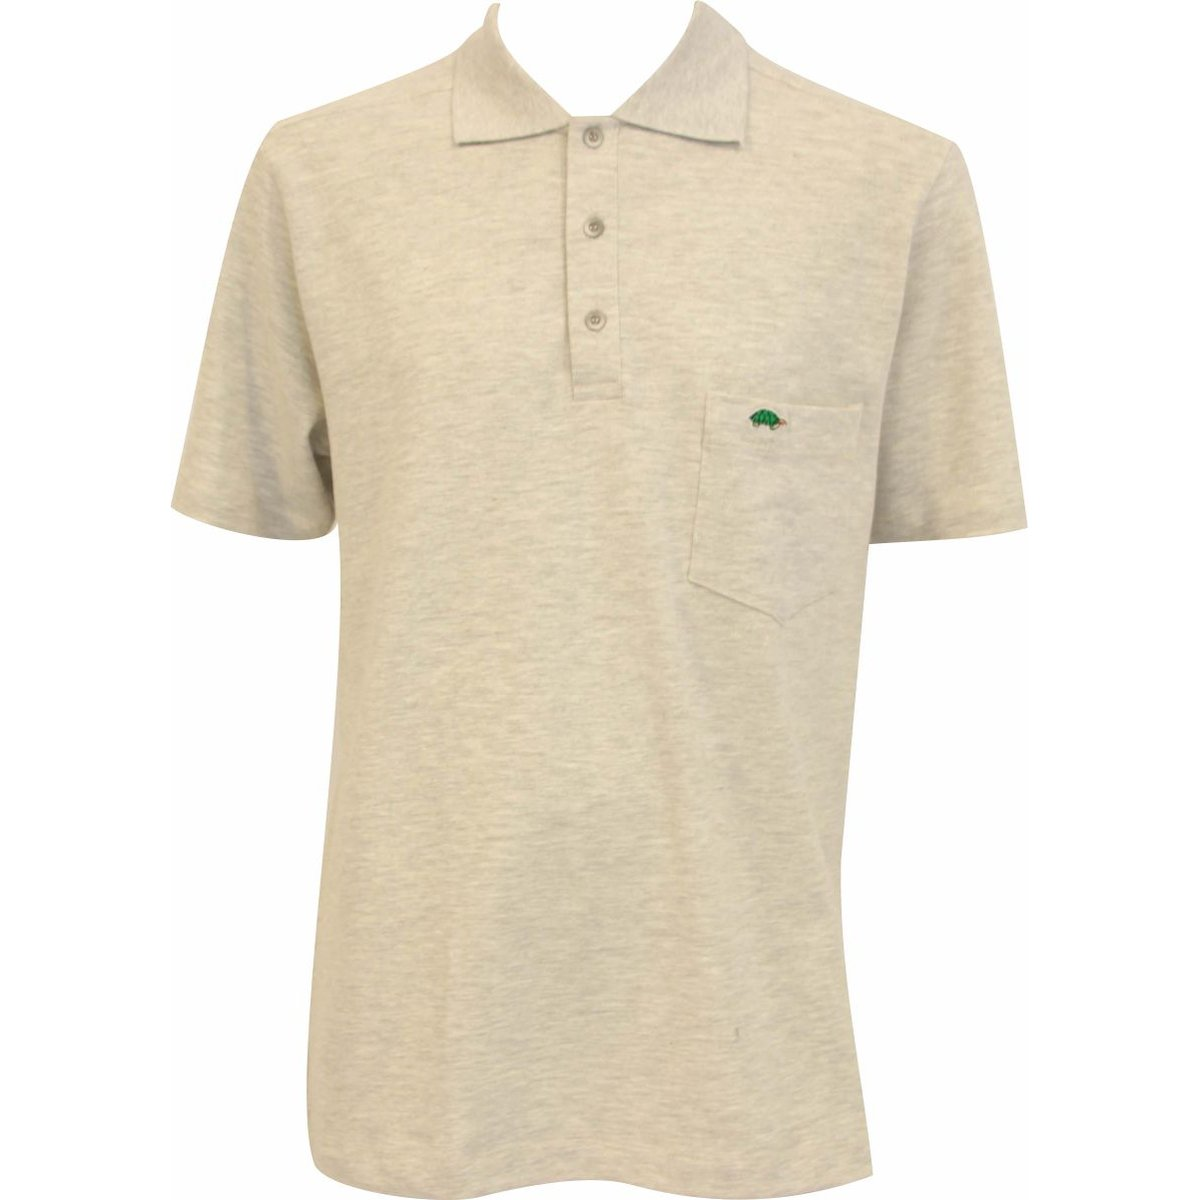 a Polo Camisa Camisa Cinza Pique Pau Pau a ISvwTzS